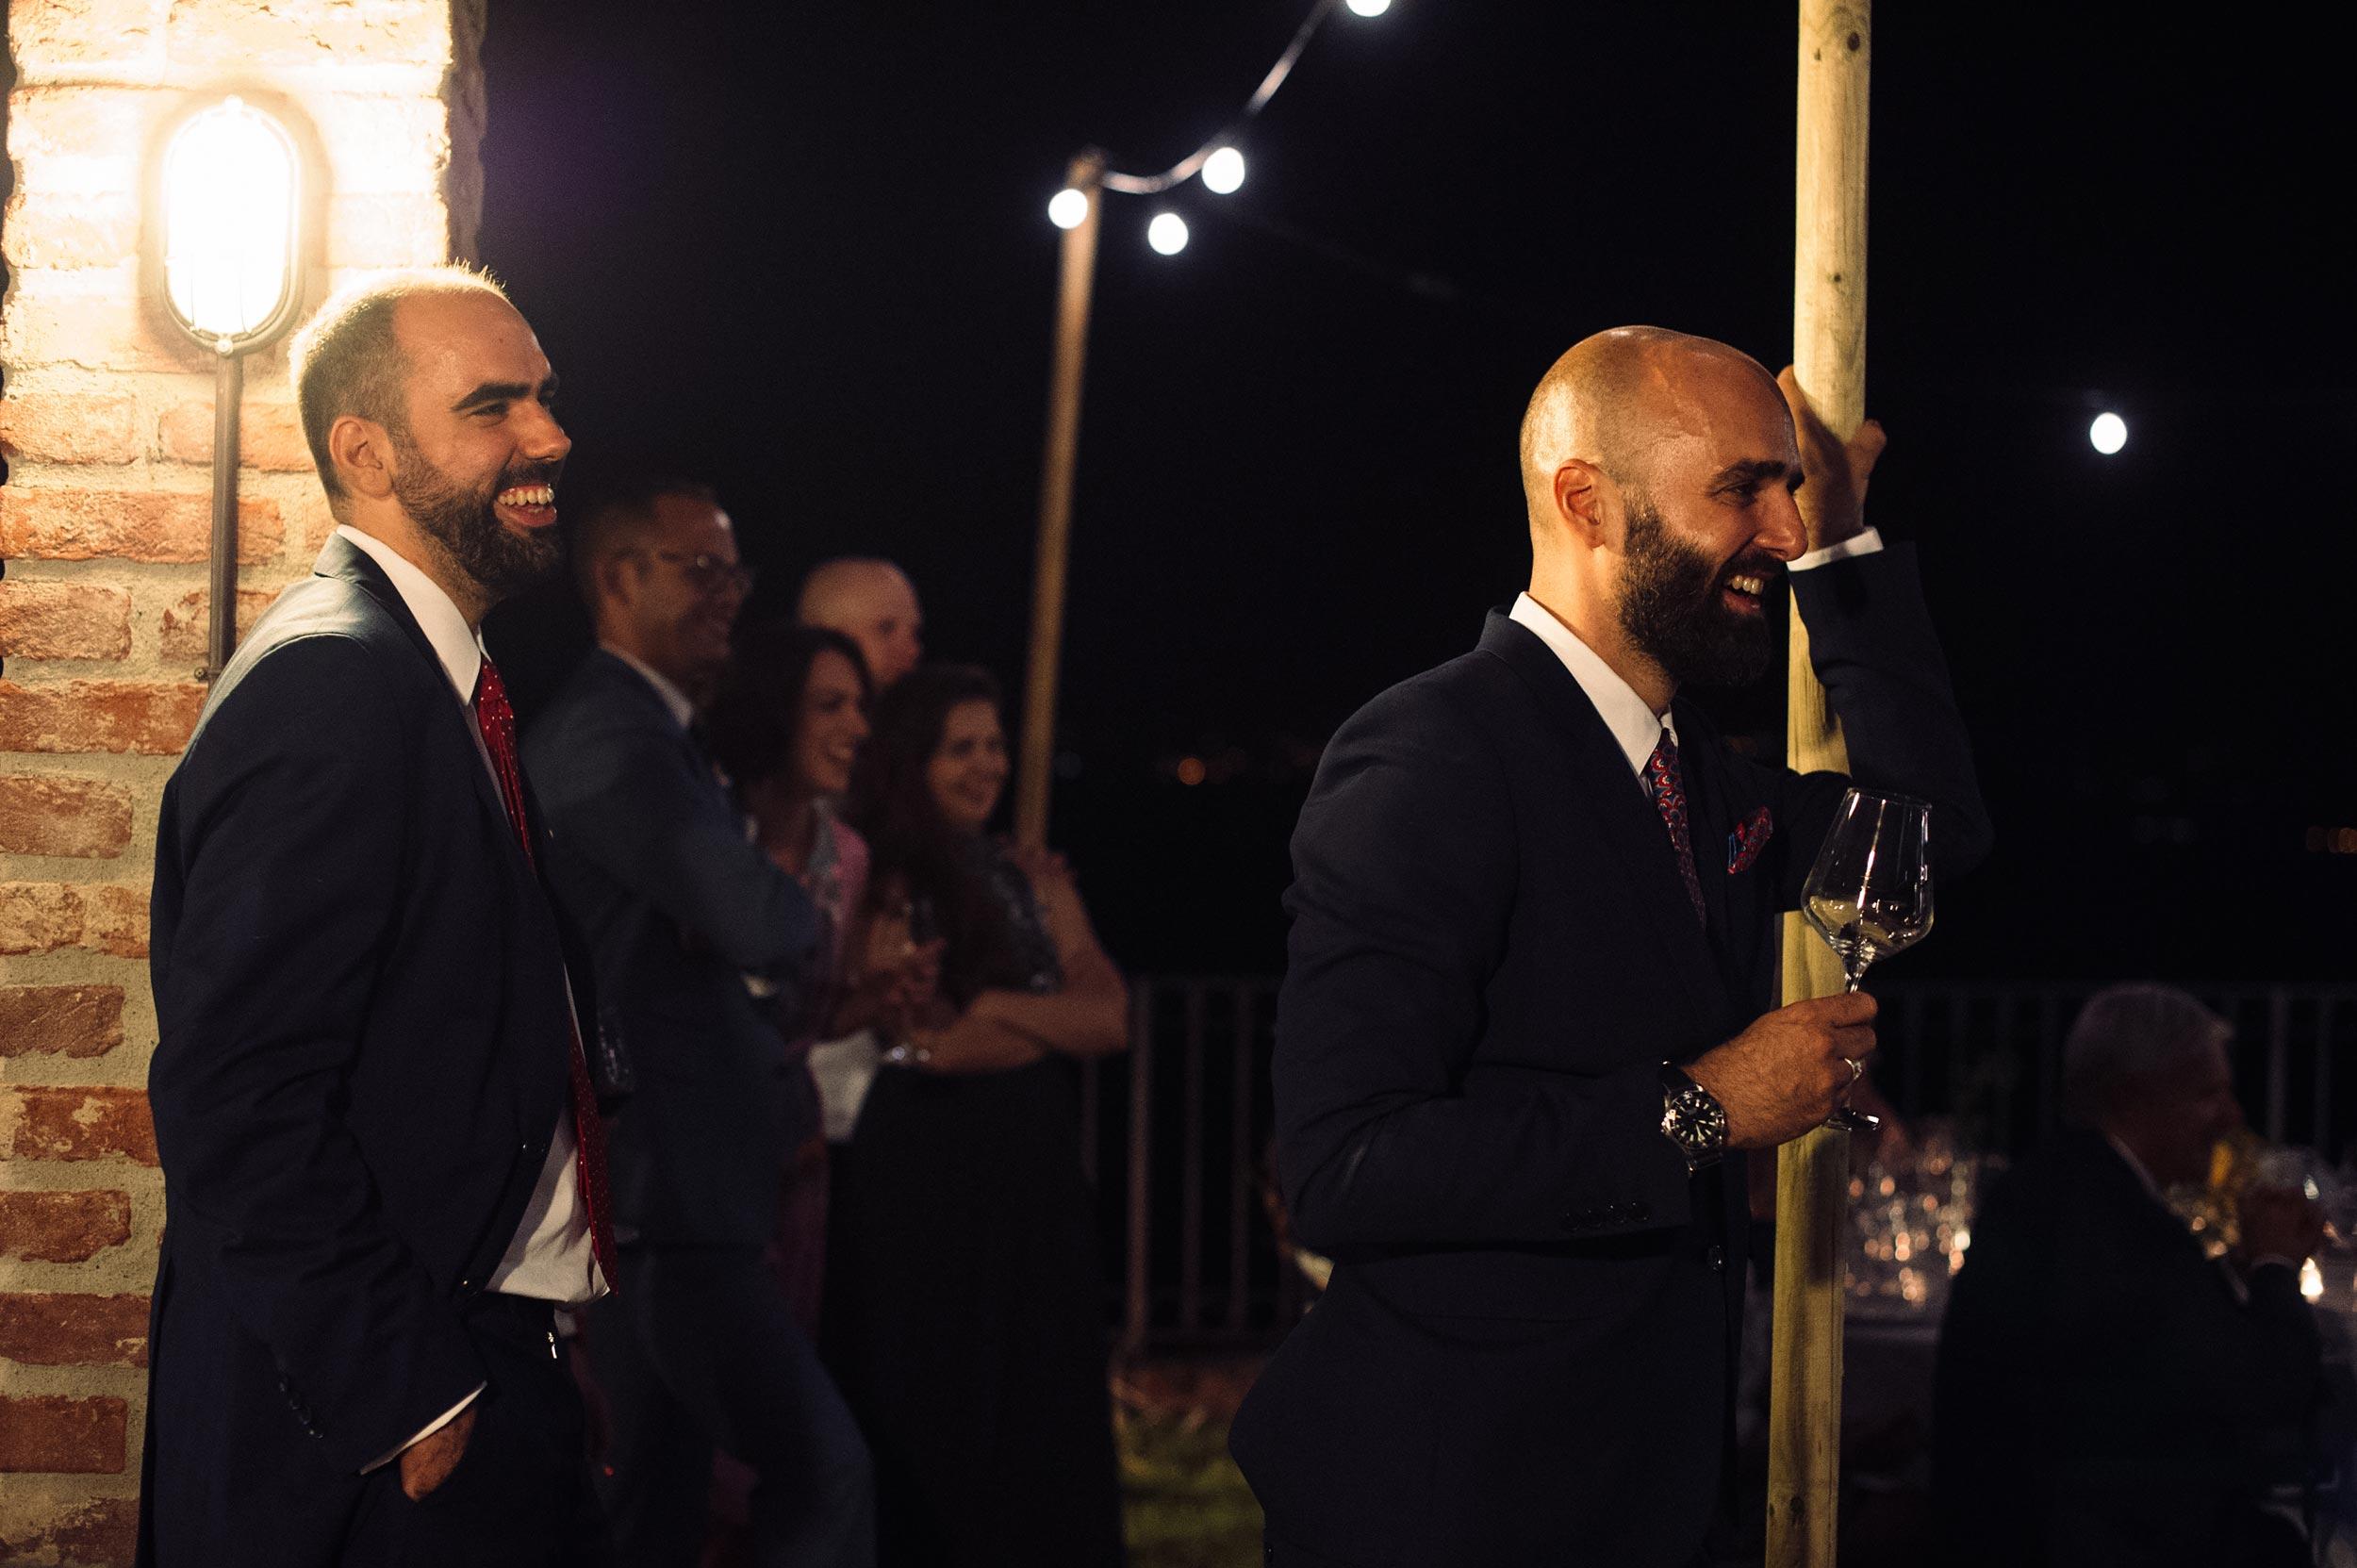 2016-Davor-Chiara-Monferrato-Asti-Vercelli-Wedding-Photographer-Italy-Alessandro-Avenali-82.jpg